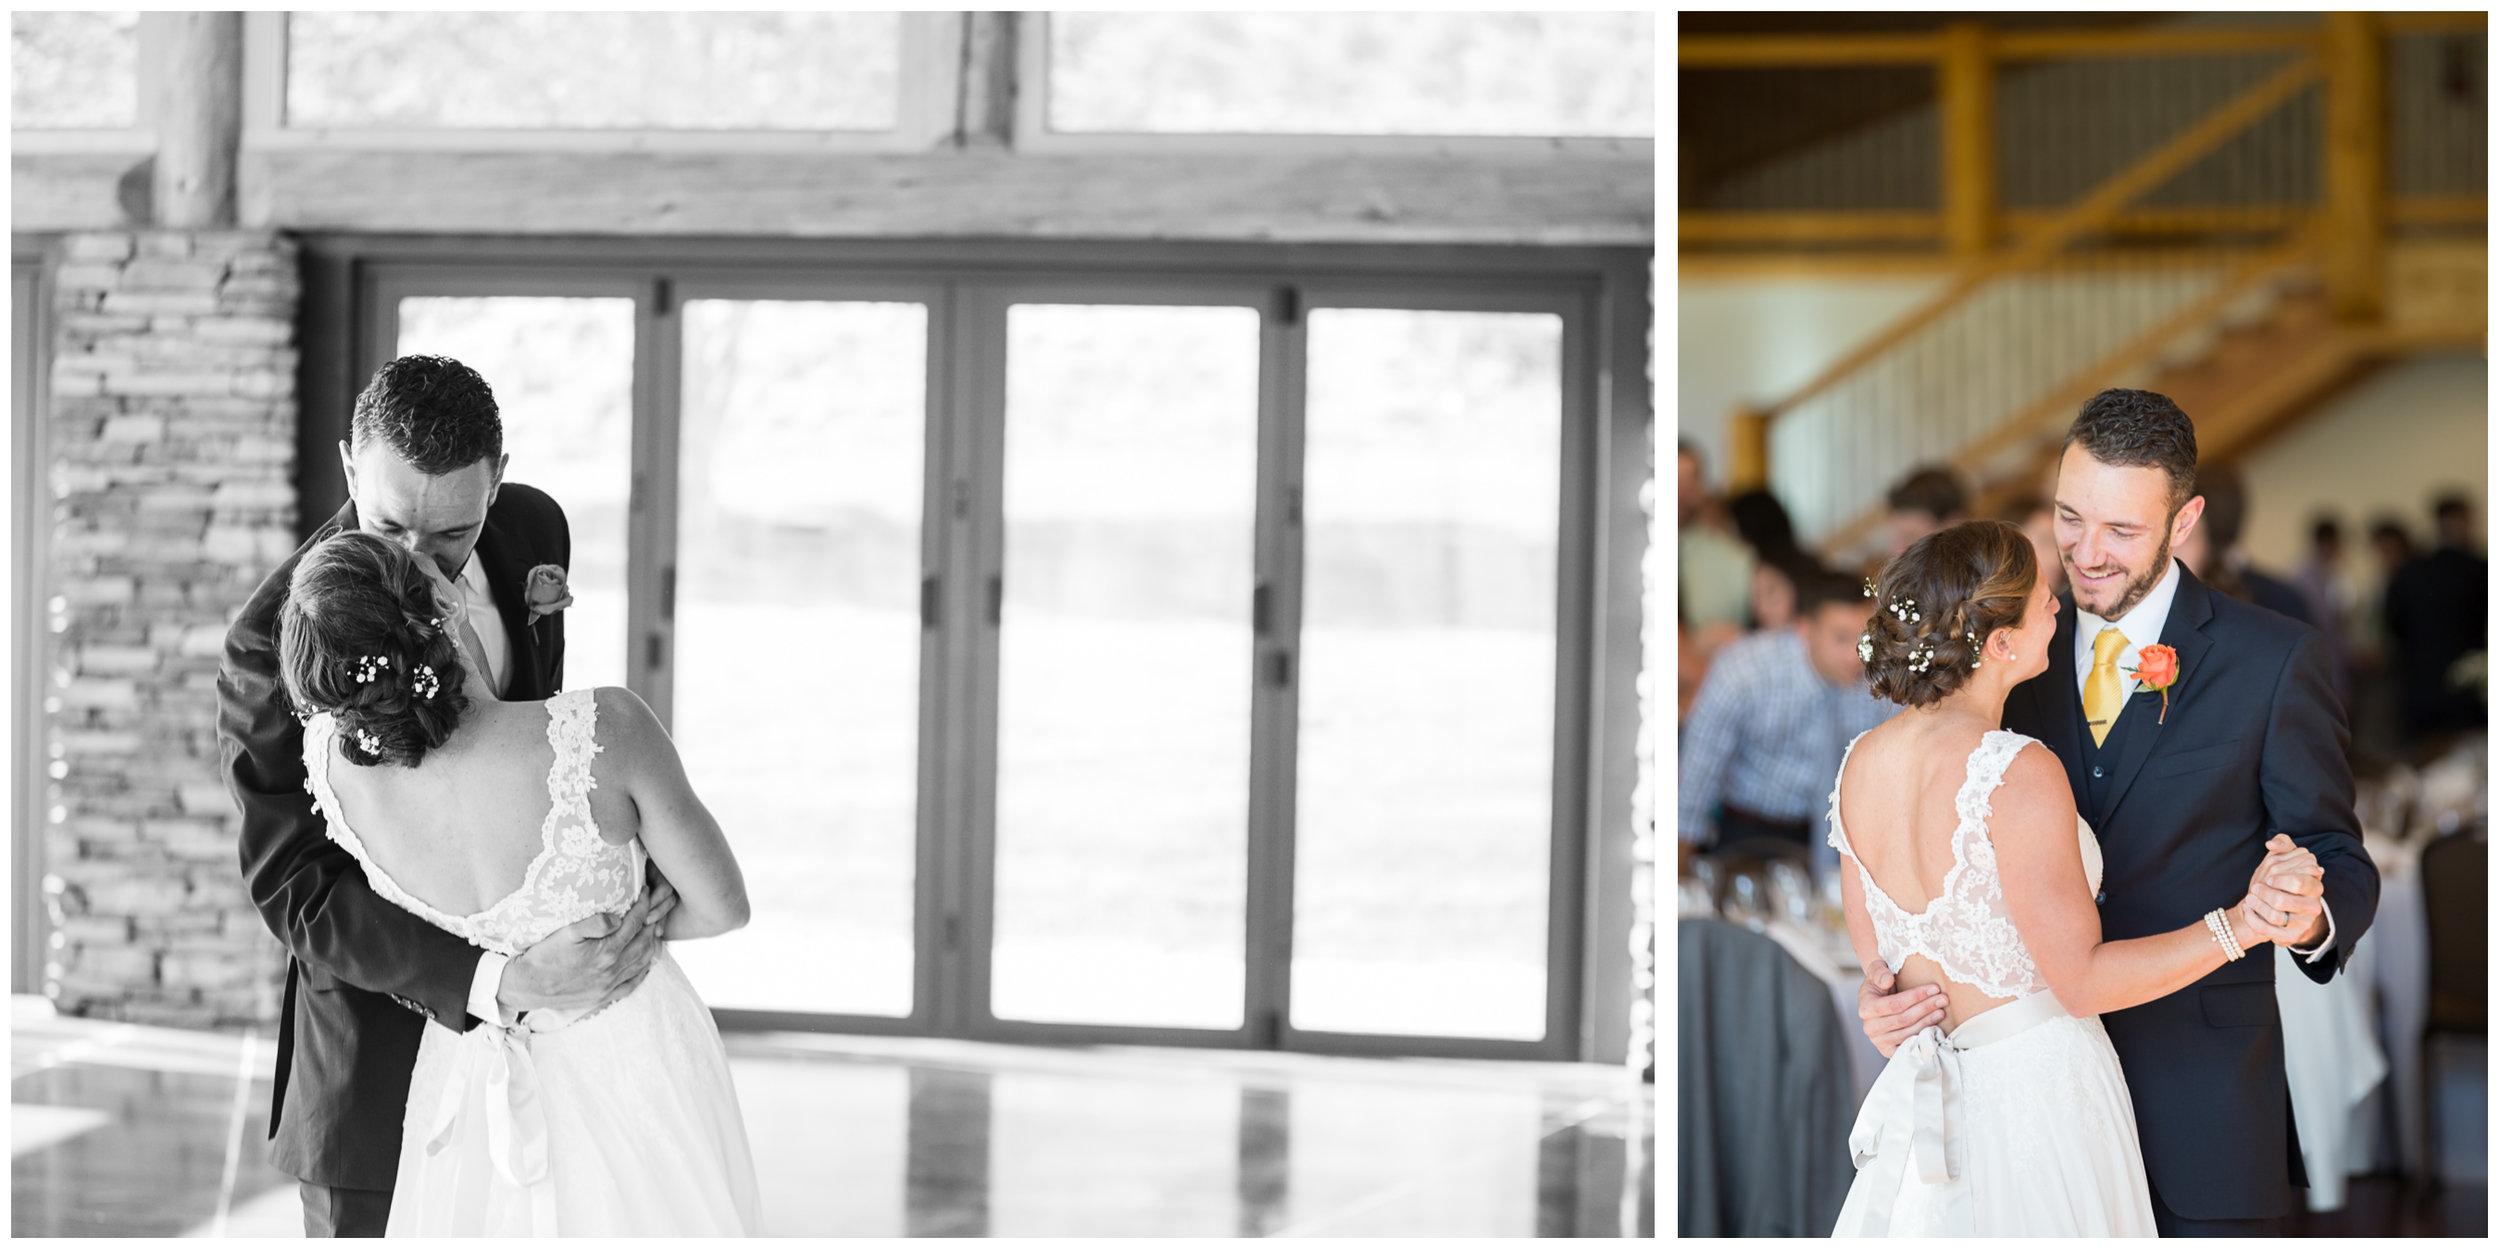 Thompson Wedding 12.jpg